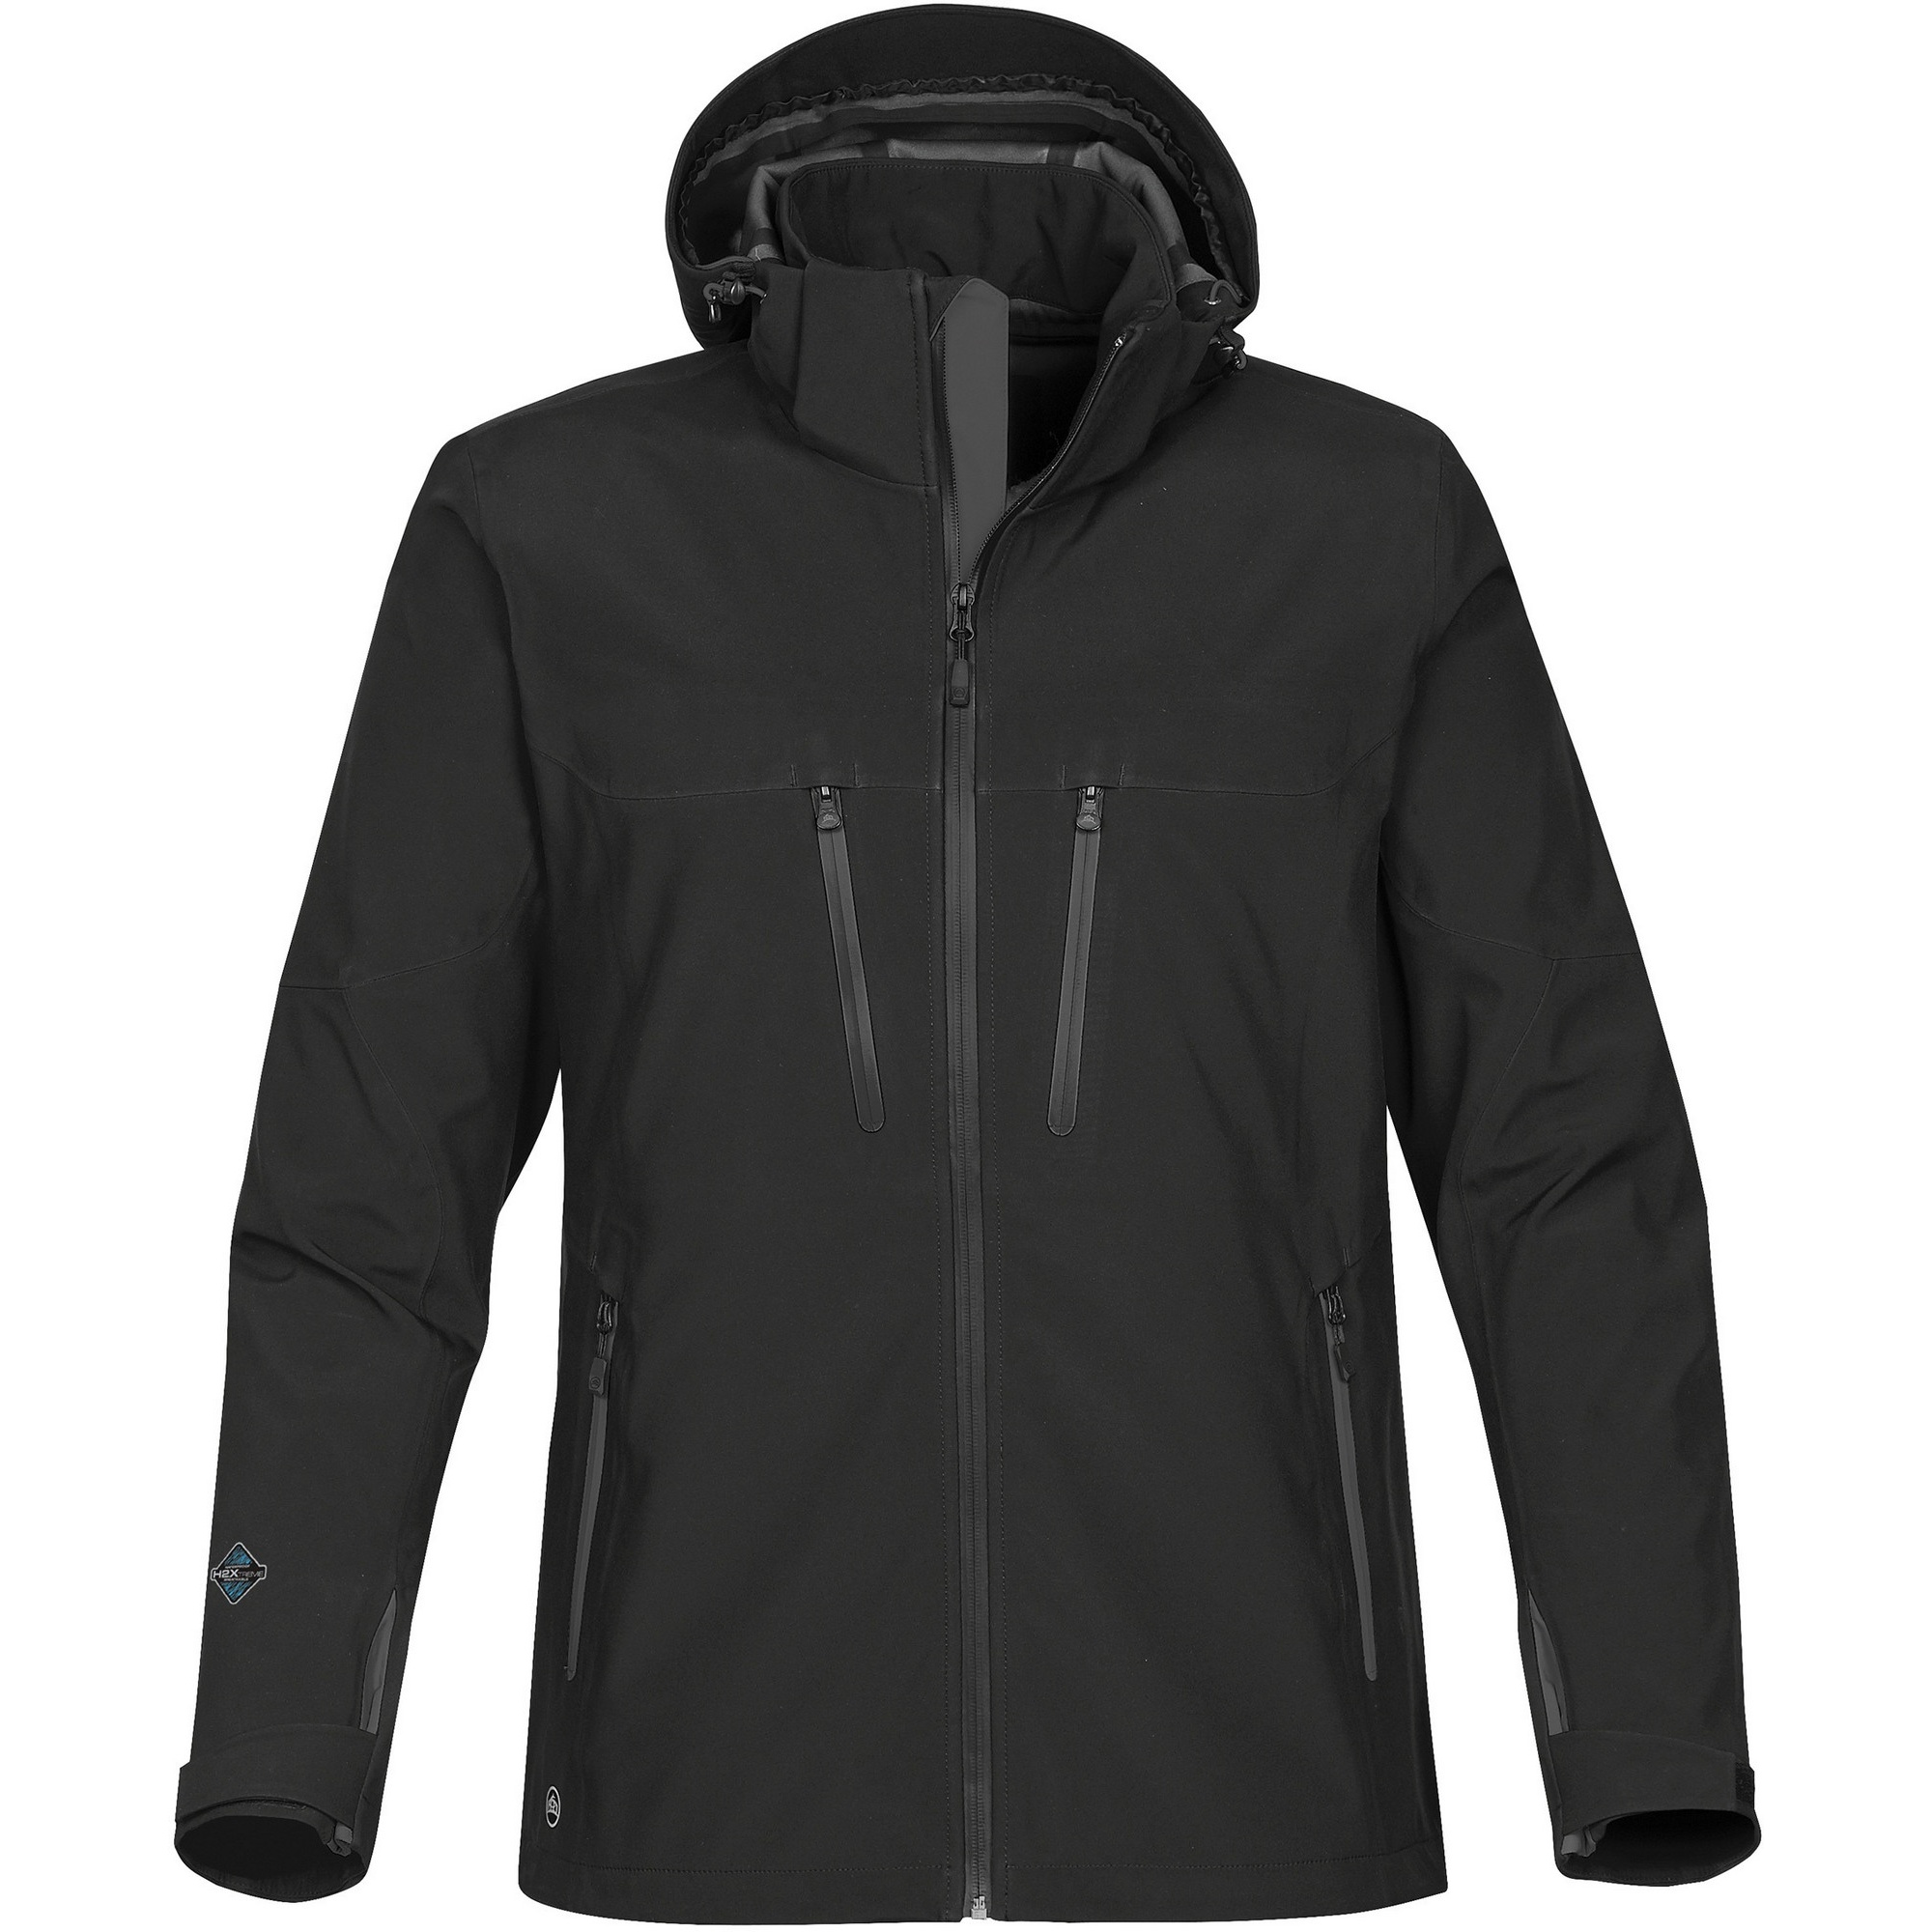 Stormtech Mens Patrol Softshell Jacket (M) (Black/Carbon)